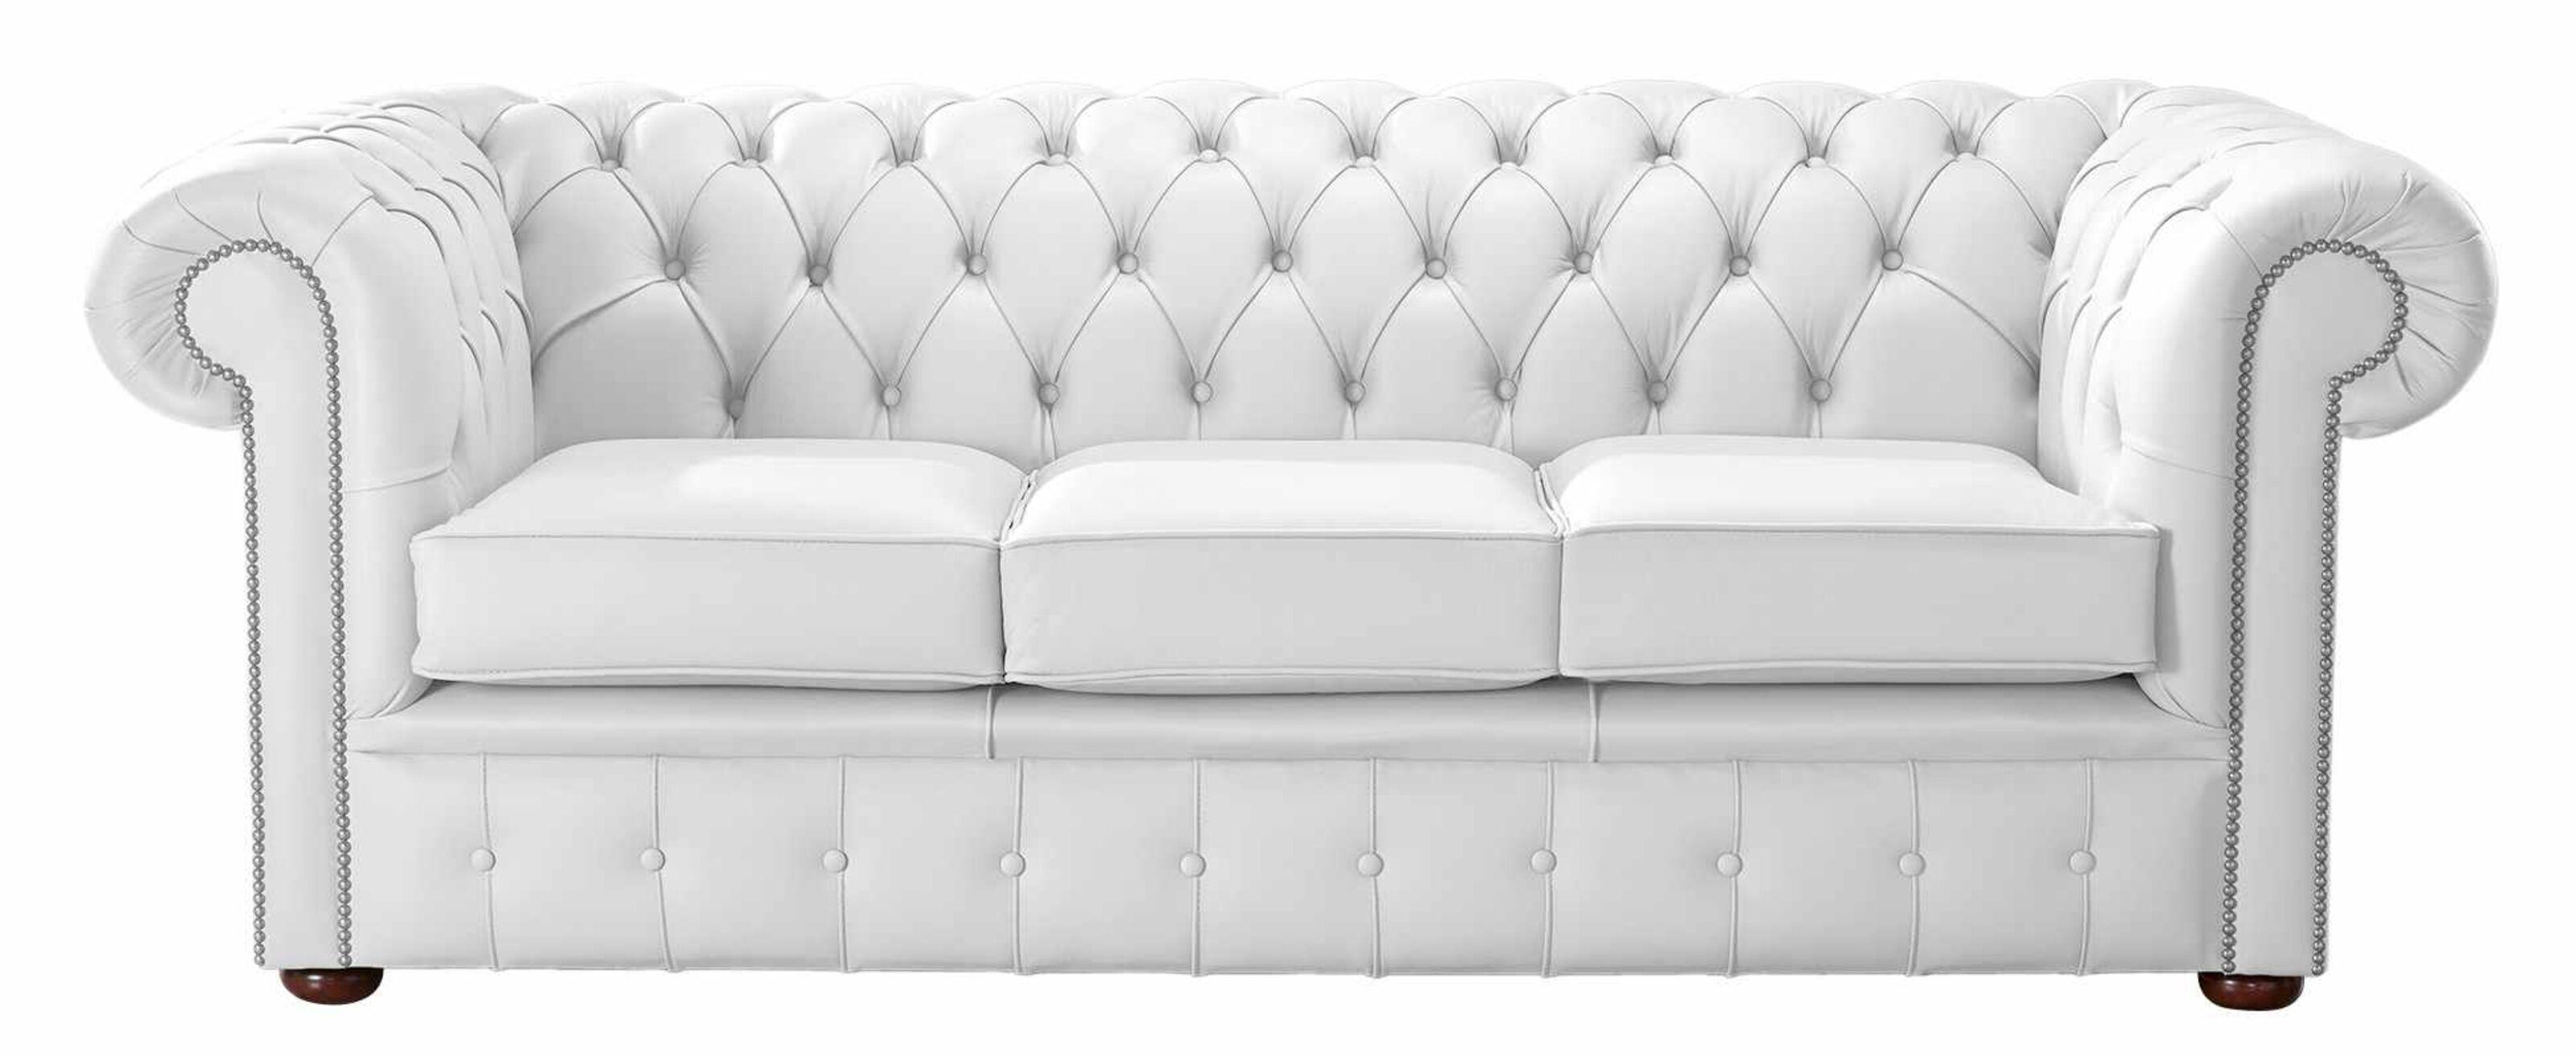 - Winter White Leather Chesterfield 3 Seater Sofa DesignerSofas4U